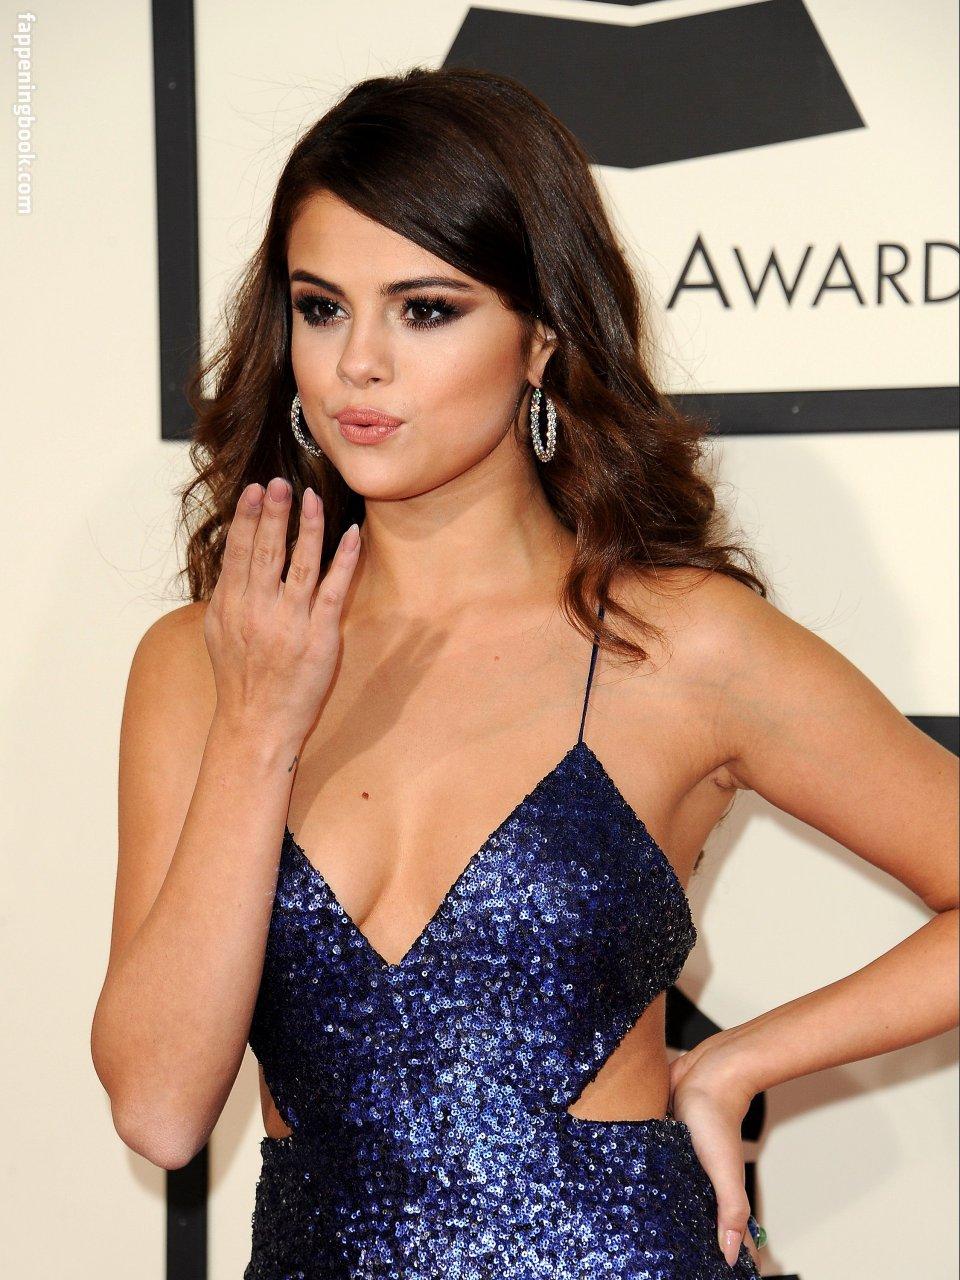 Selena Gomez Nude, Sexy, The Fappening, Uncensored - Photo